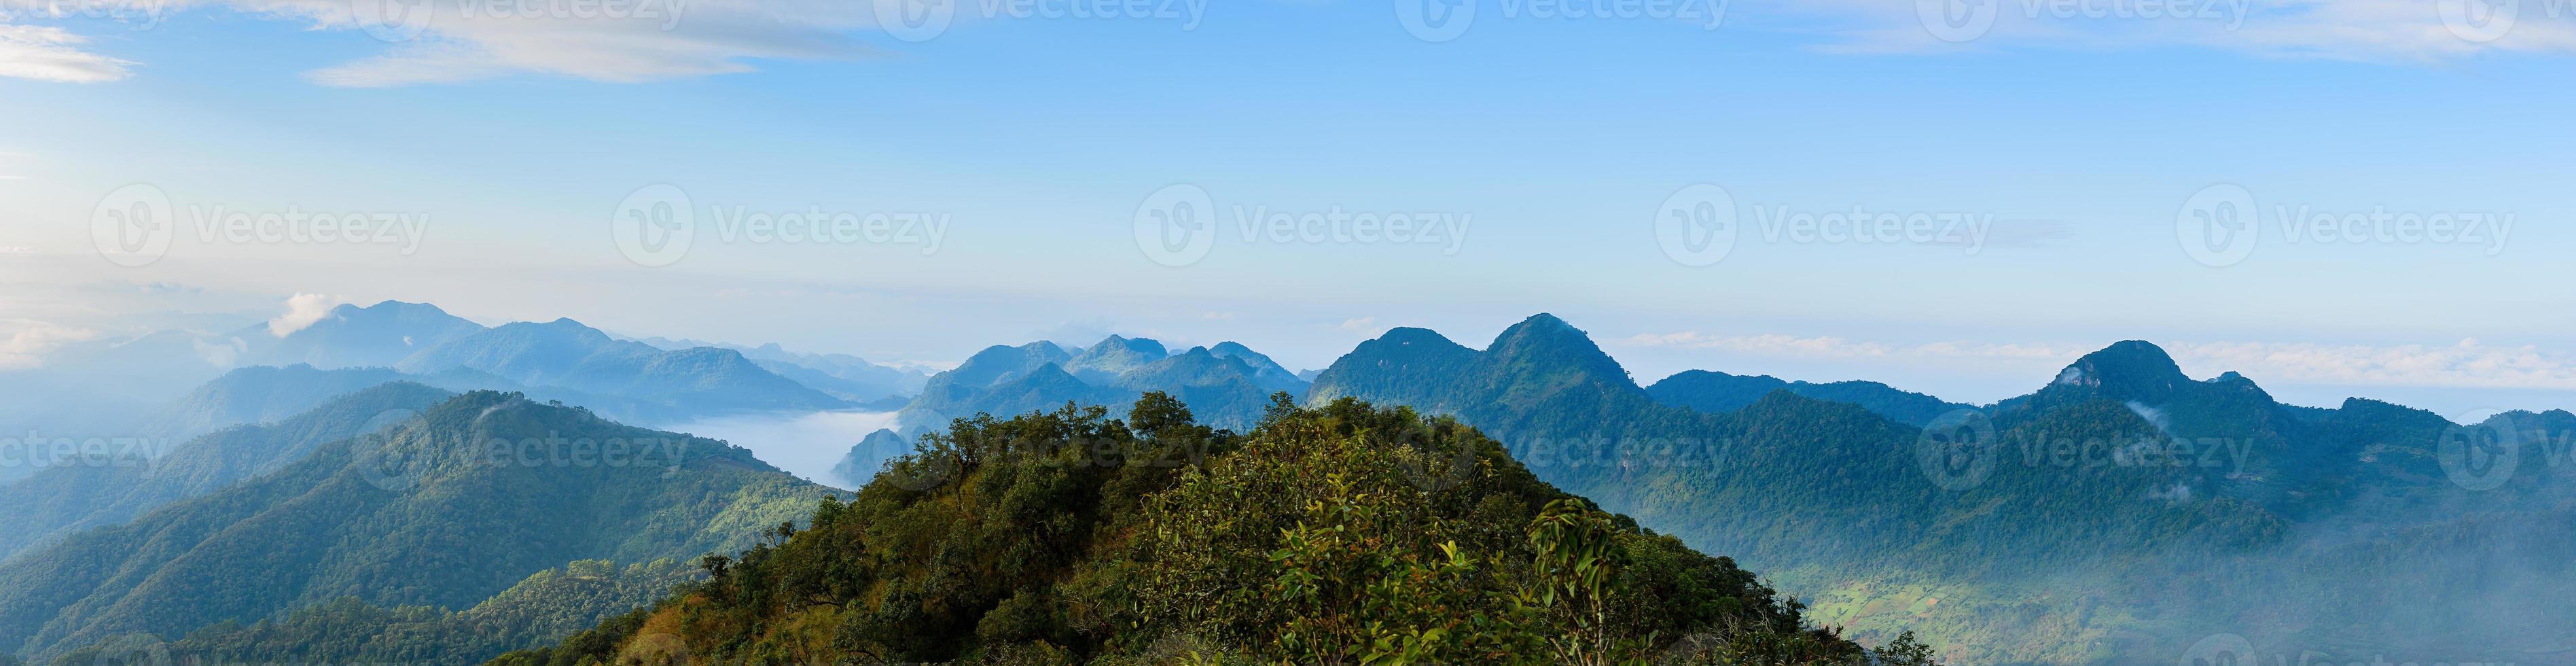 blaue Berge im Nebel foto